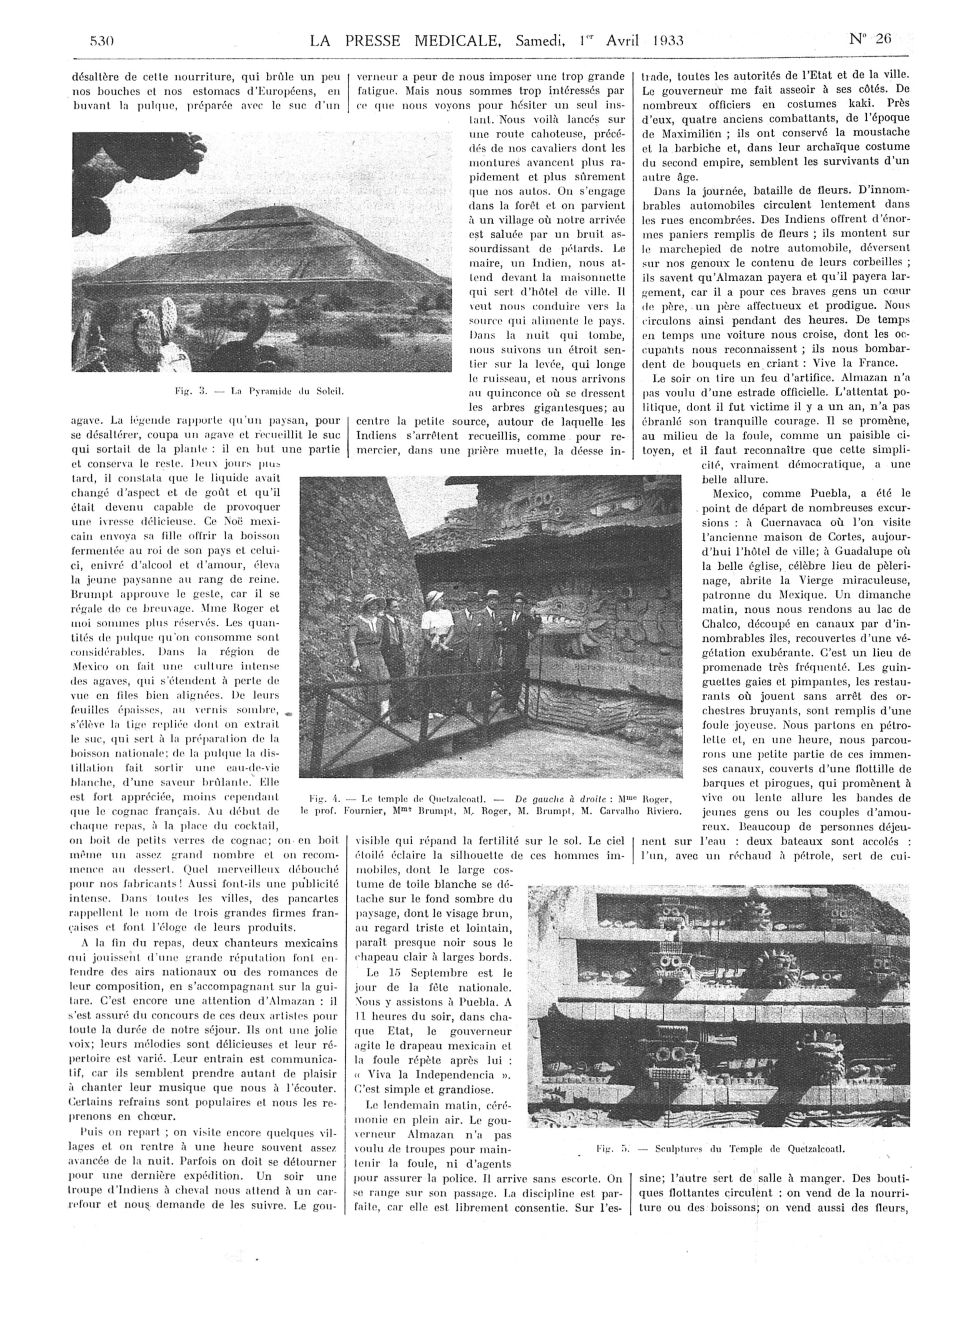 Fig. 3. La Pyramide du Soleil / Fig. 4. Le temple de Quetzalcoalt. De gauche à droite : Mme Roger, l [...] -  - med100000x1933xartorigx0538